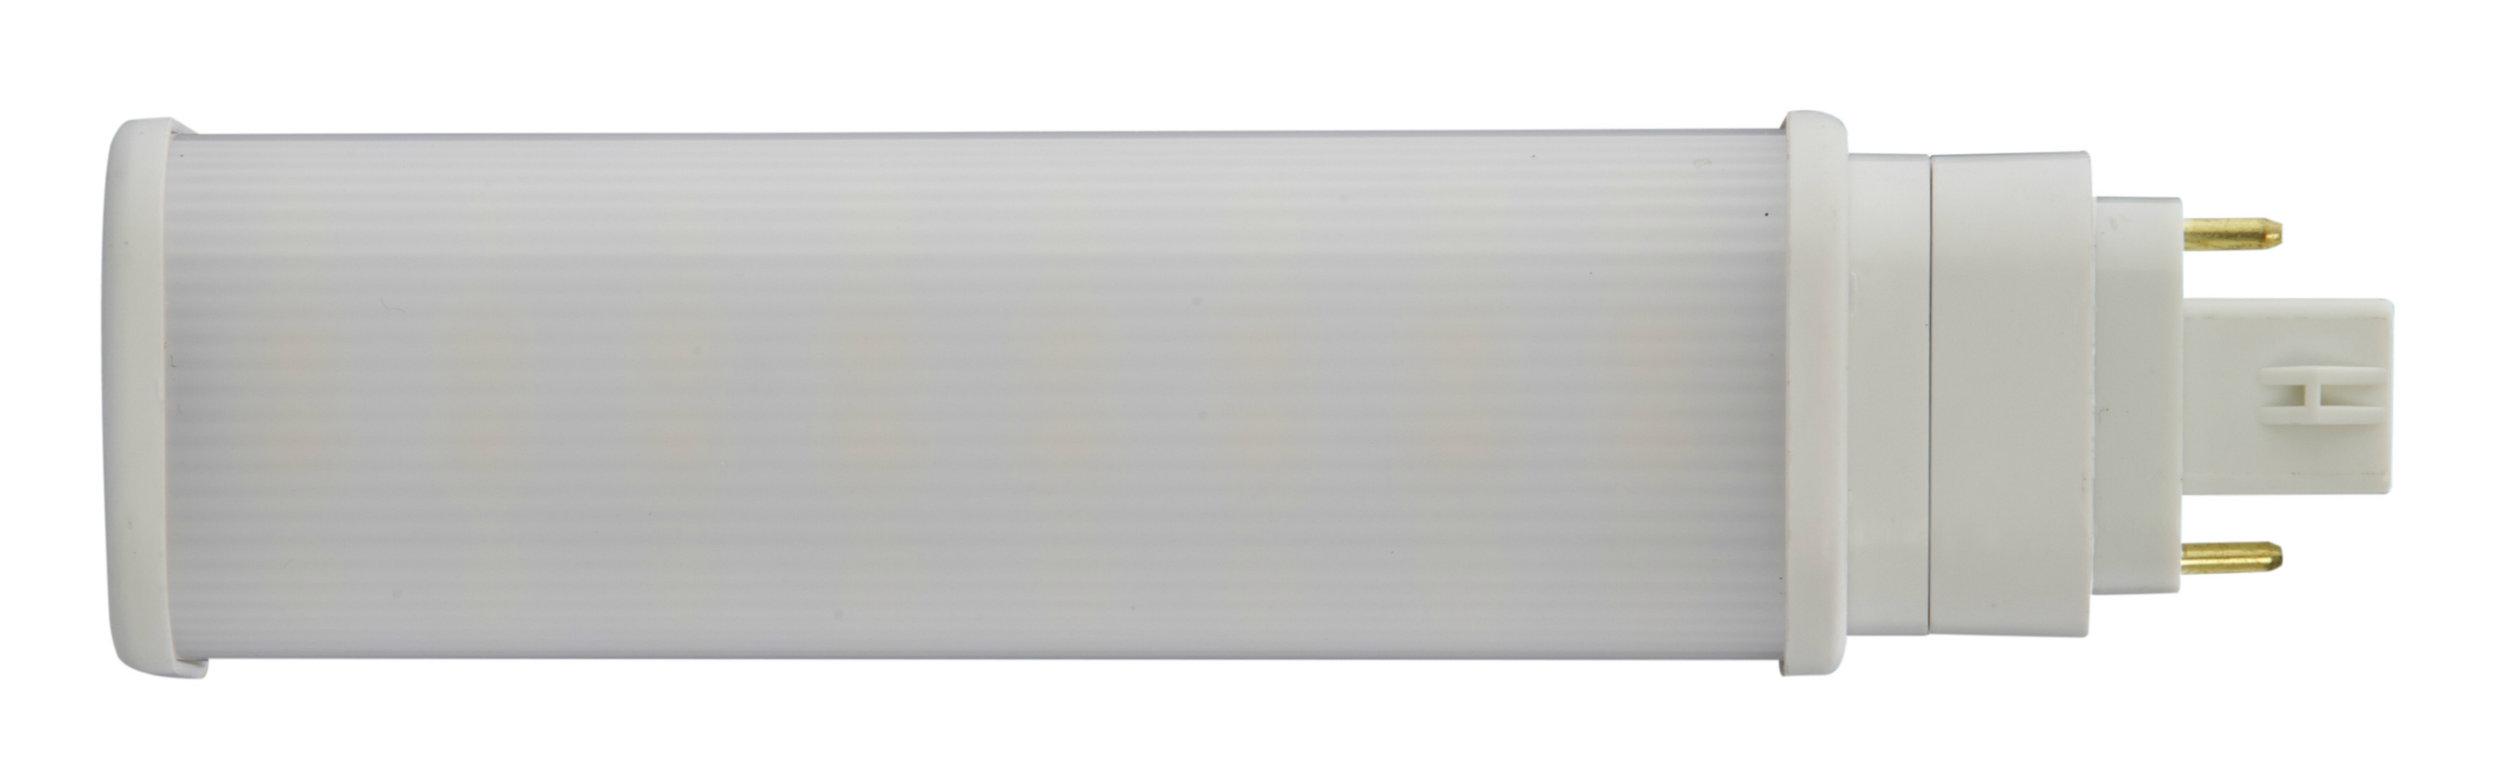 LED7302Hwebspec.jpg